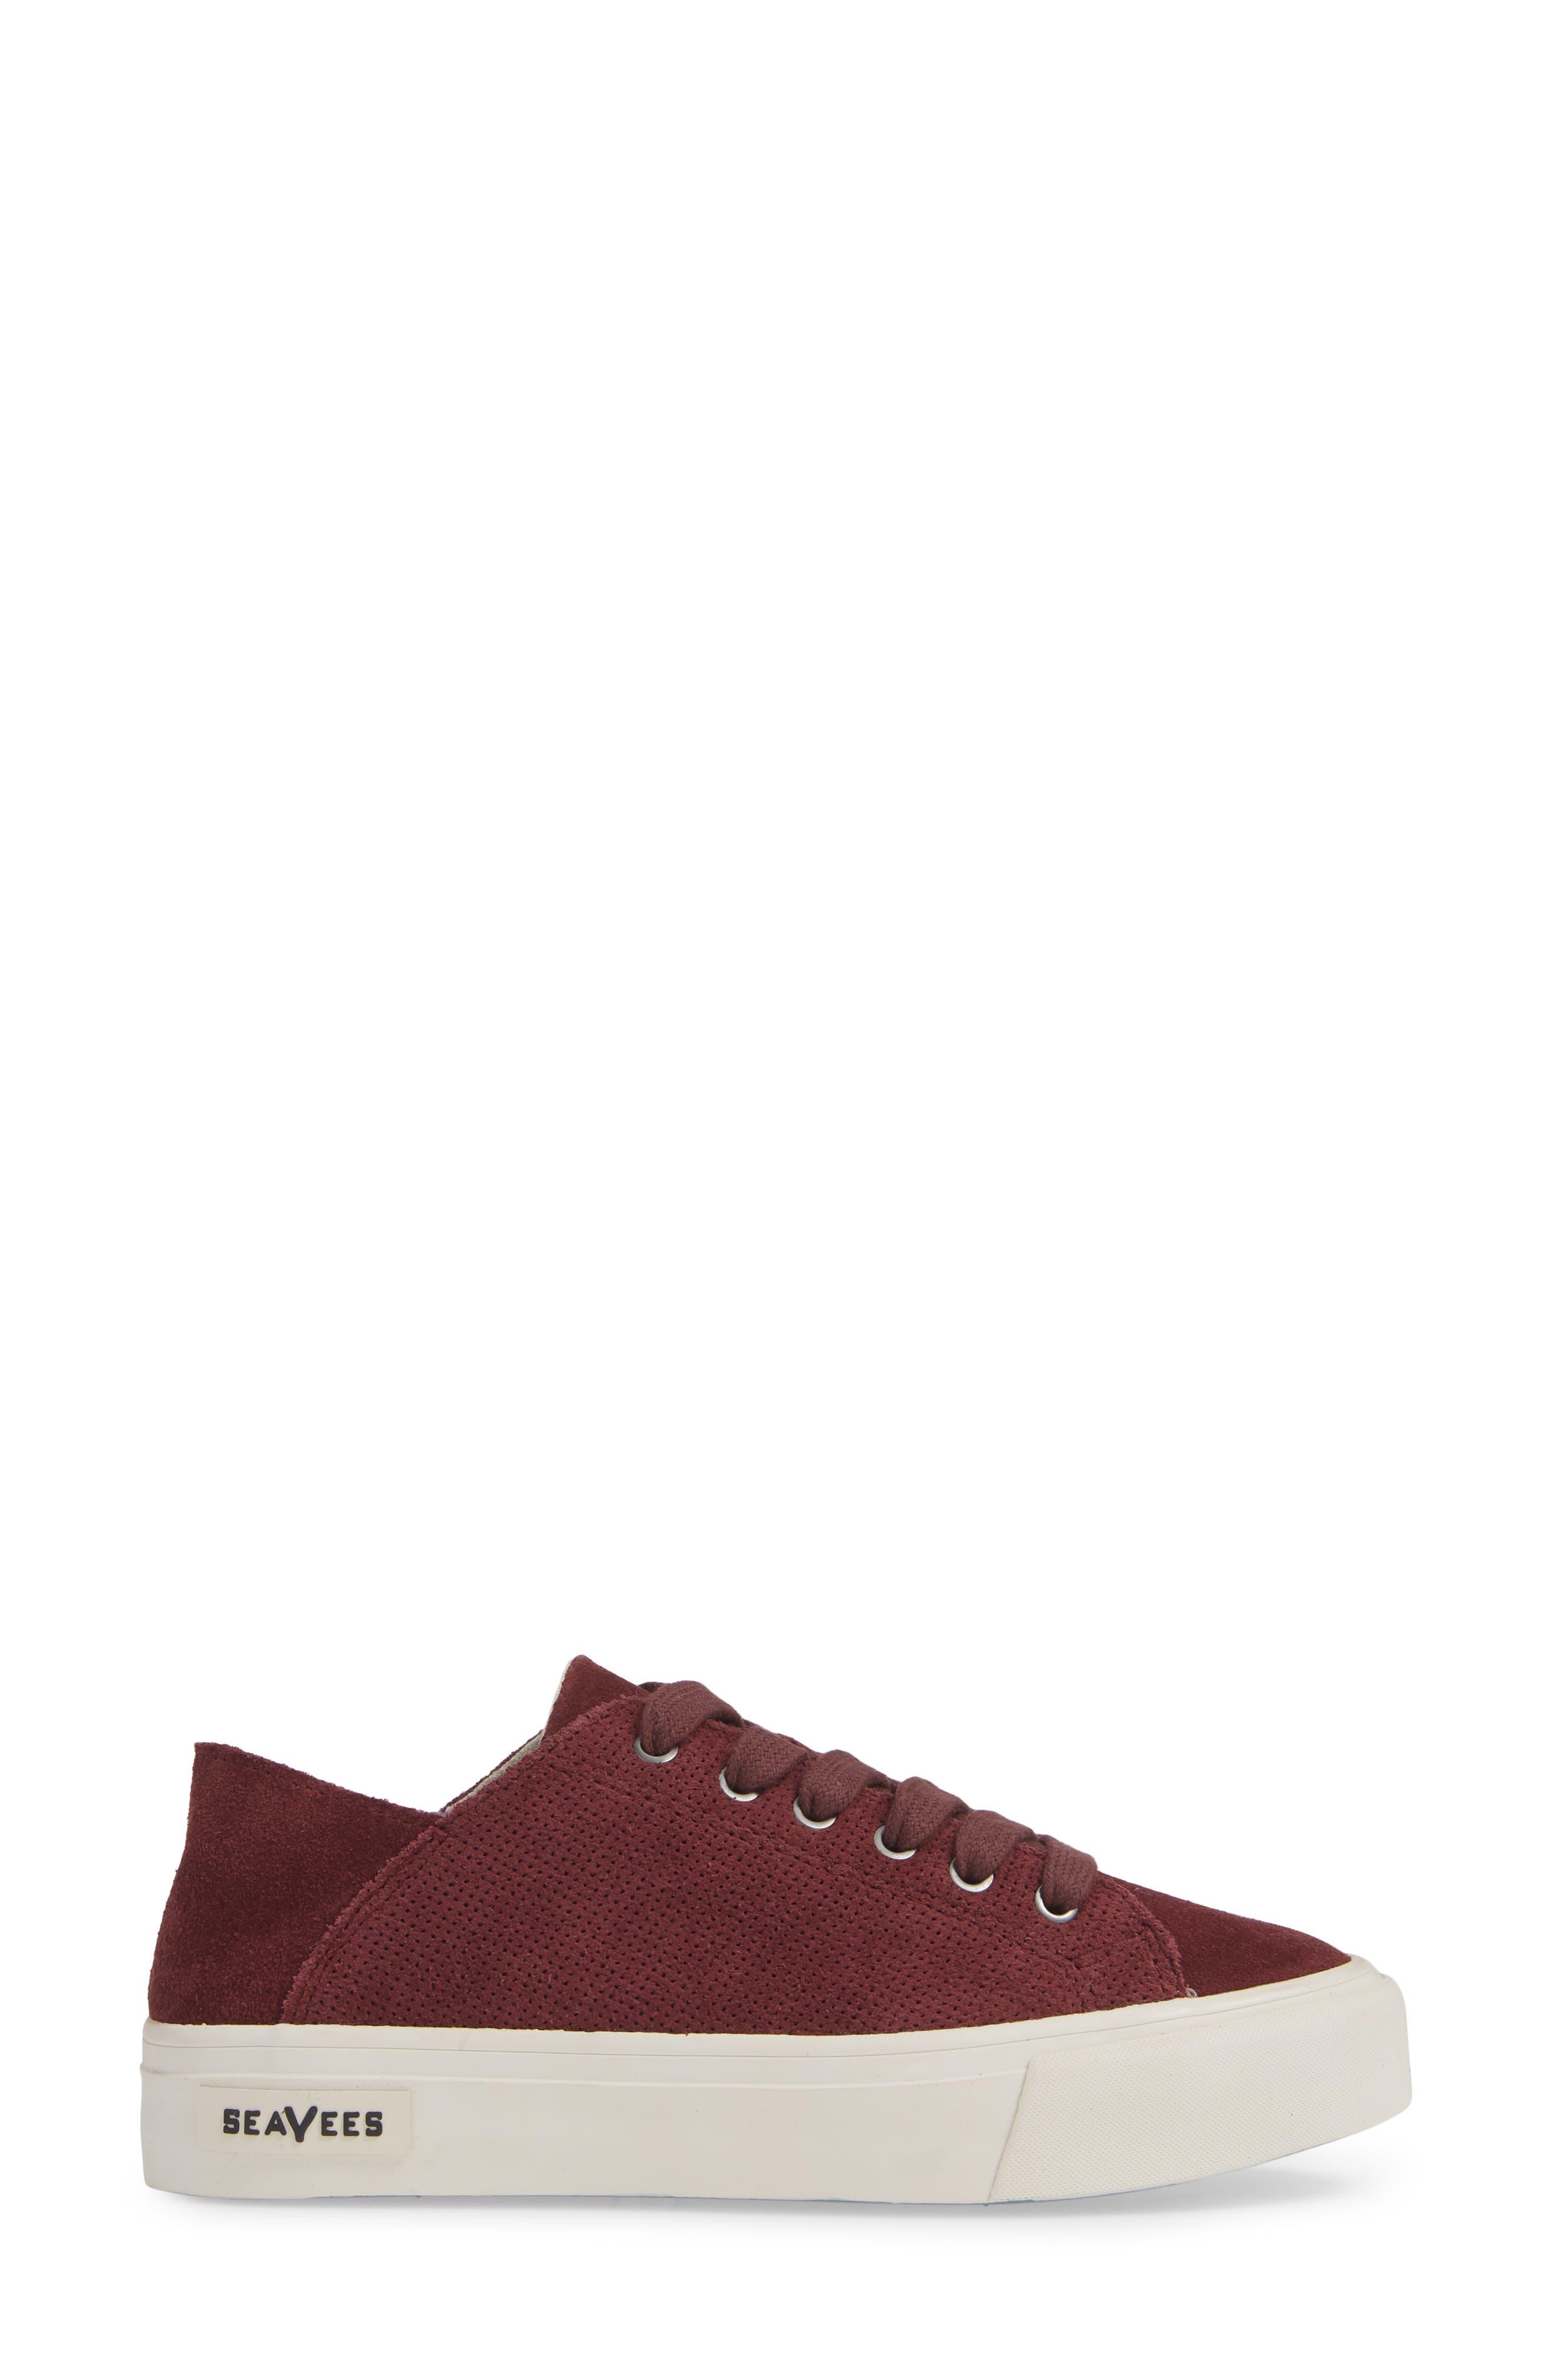 Sausalito Sneaker,                             Alternate thumbnail 3, color,                             WINE